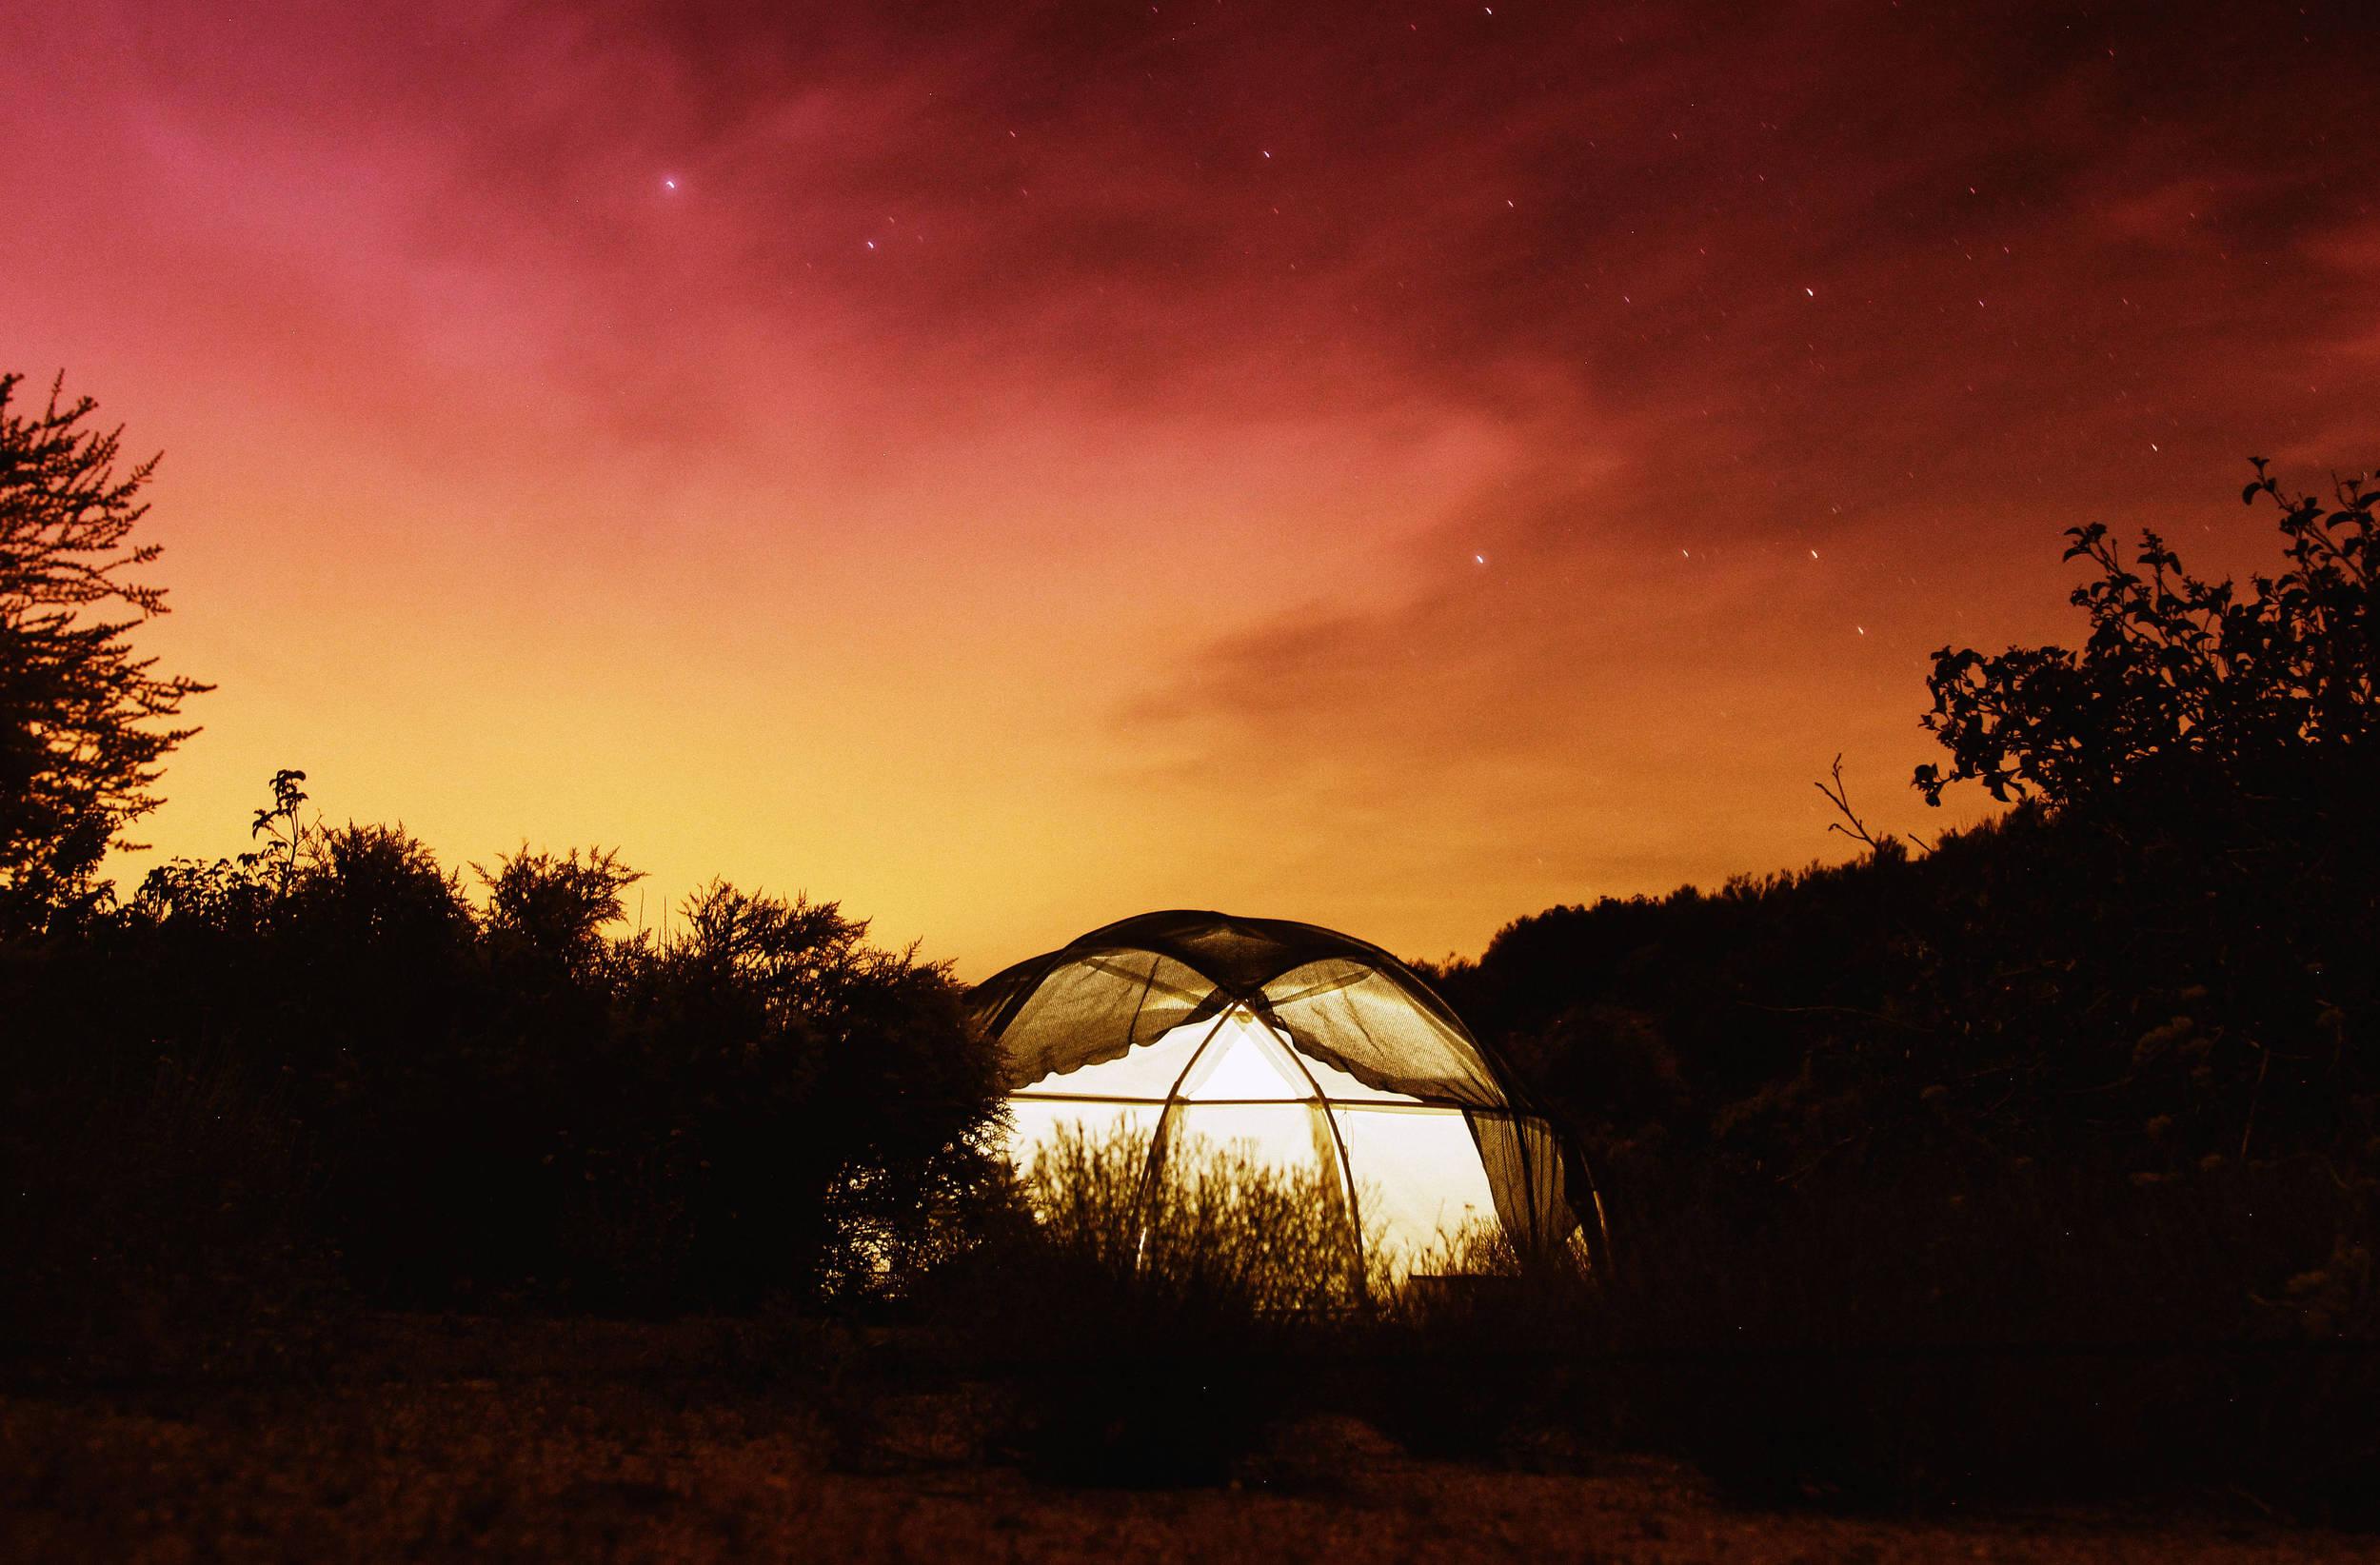 The Dome at night. Photo Josephone Blossfeld